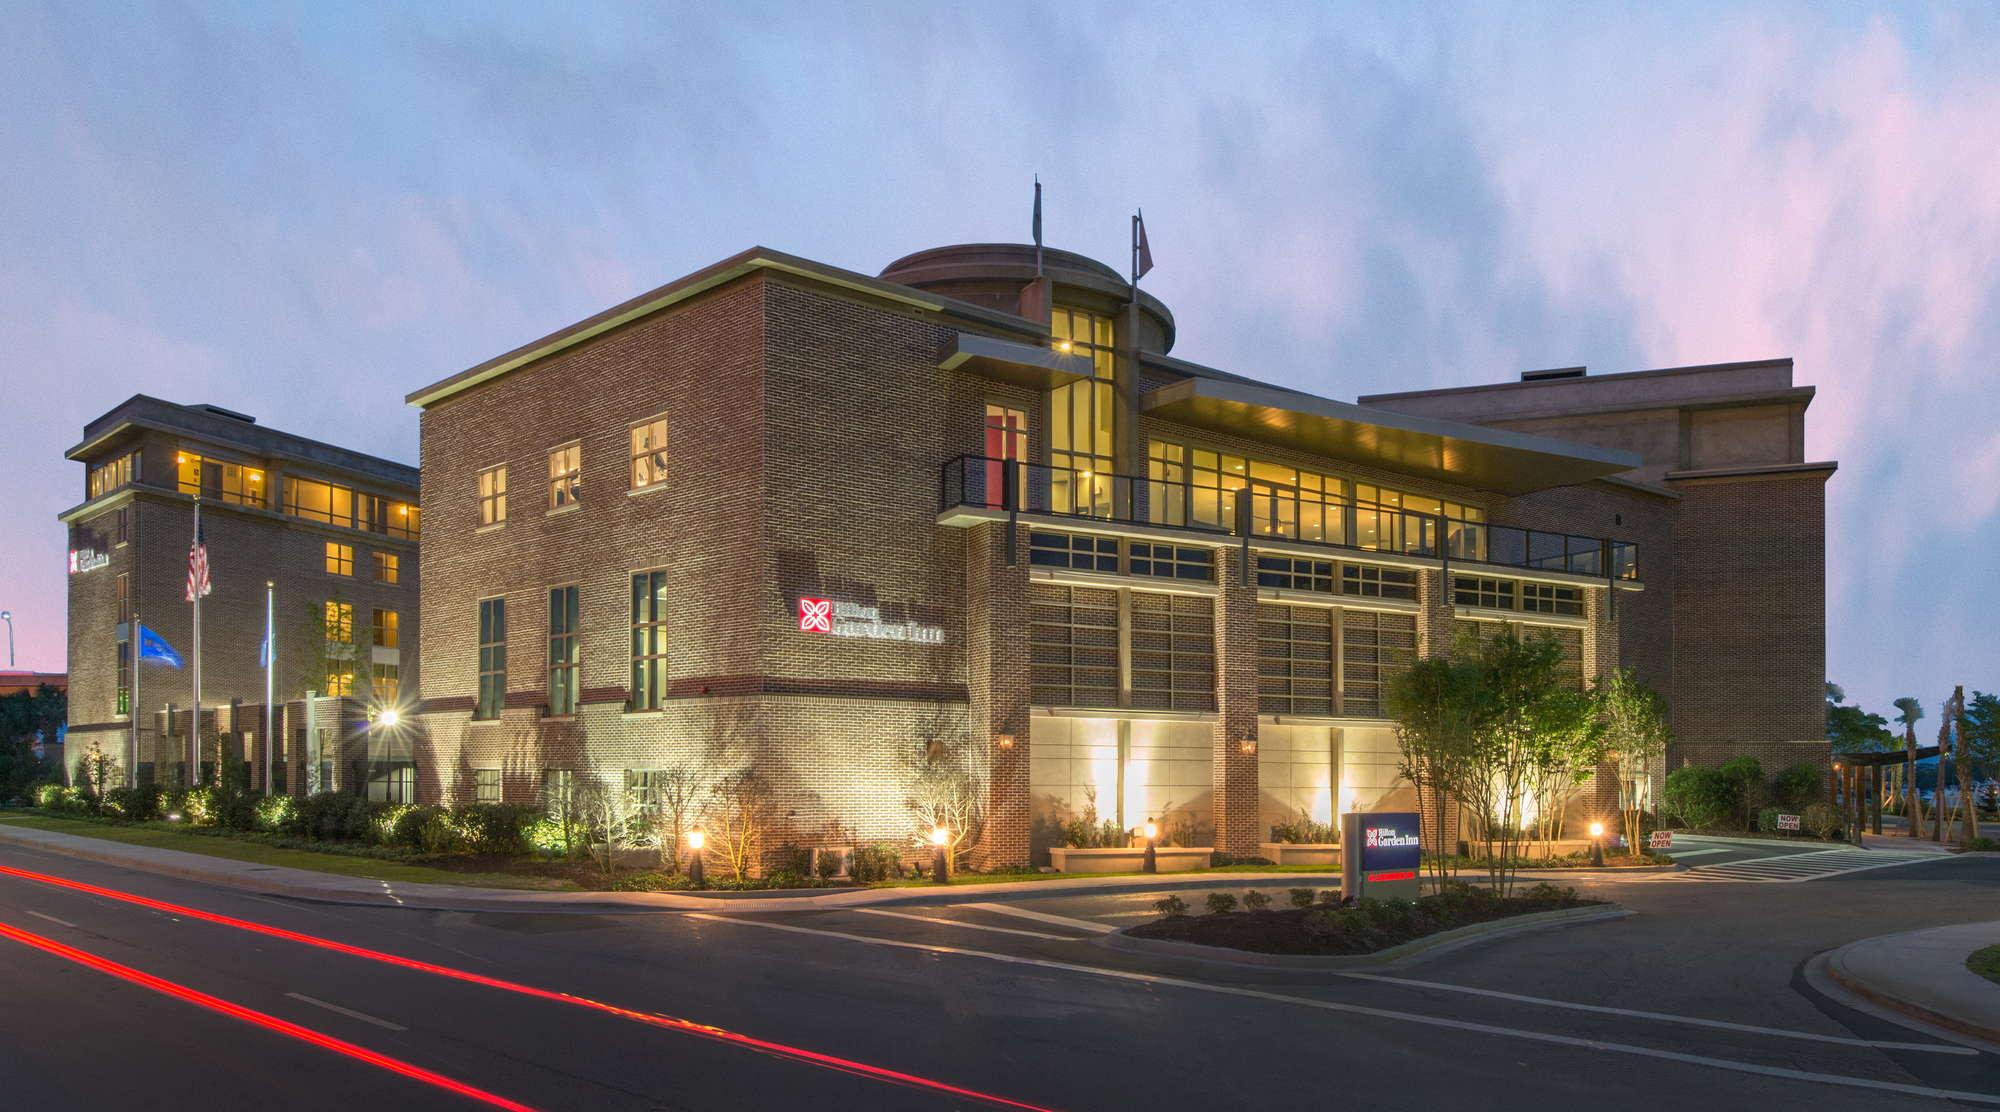 Hilton Garden Inn Charleston Waterfront Expert Review | Fodor\'s Travel